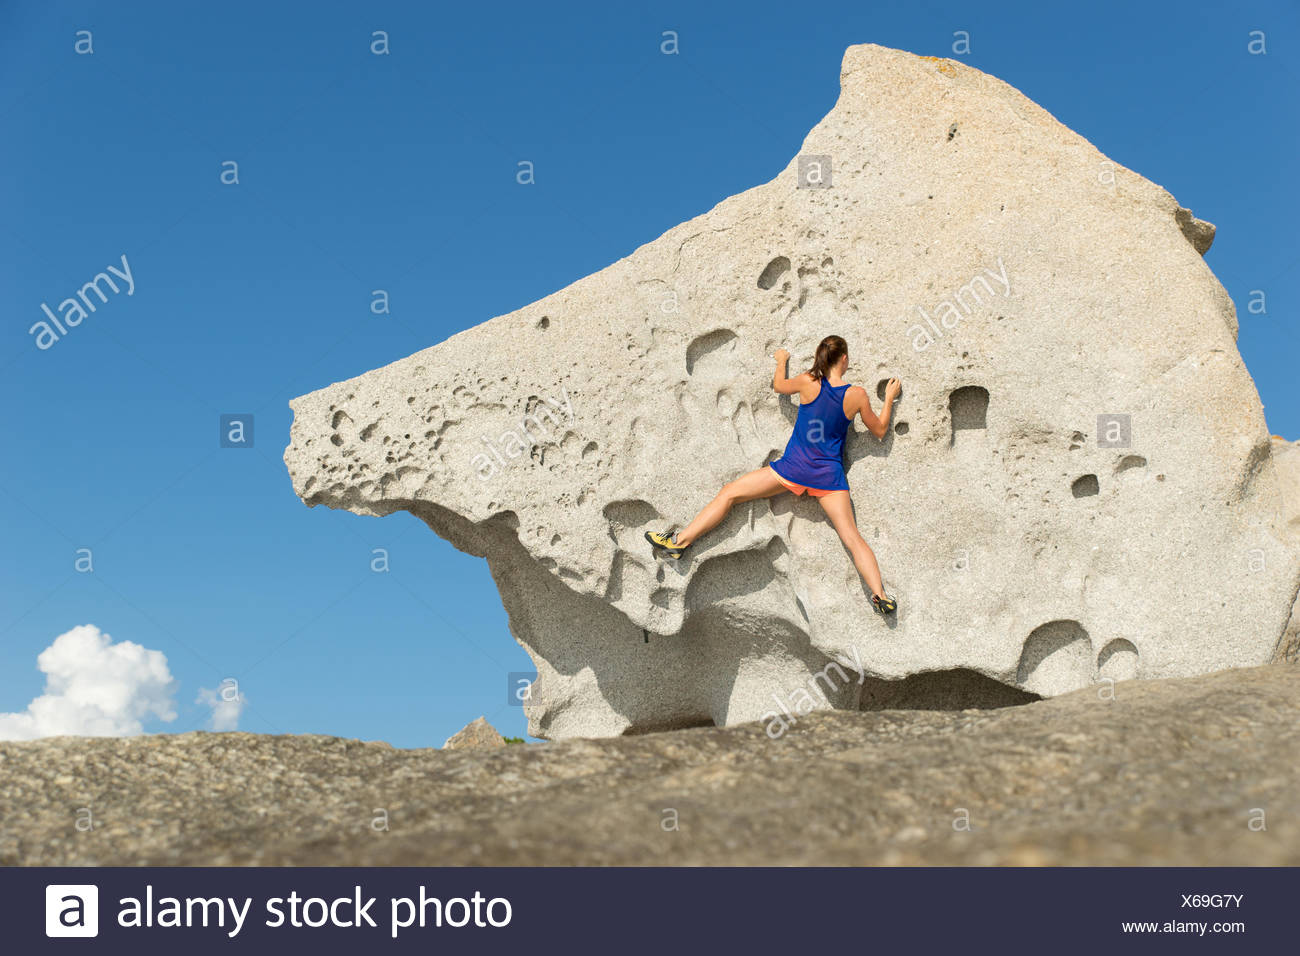 France, Corsica, Young woman climbing big rock - Stock Image